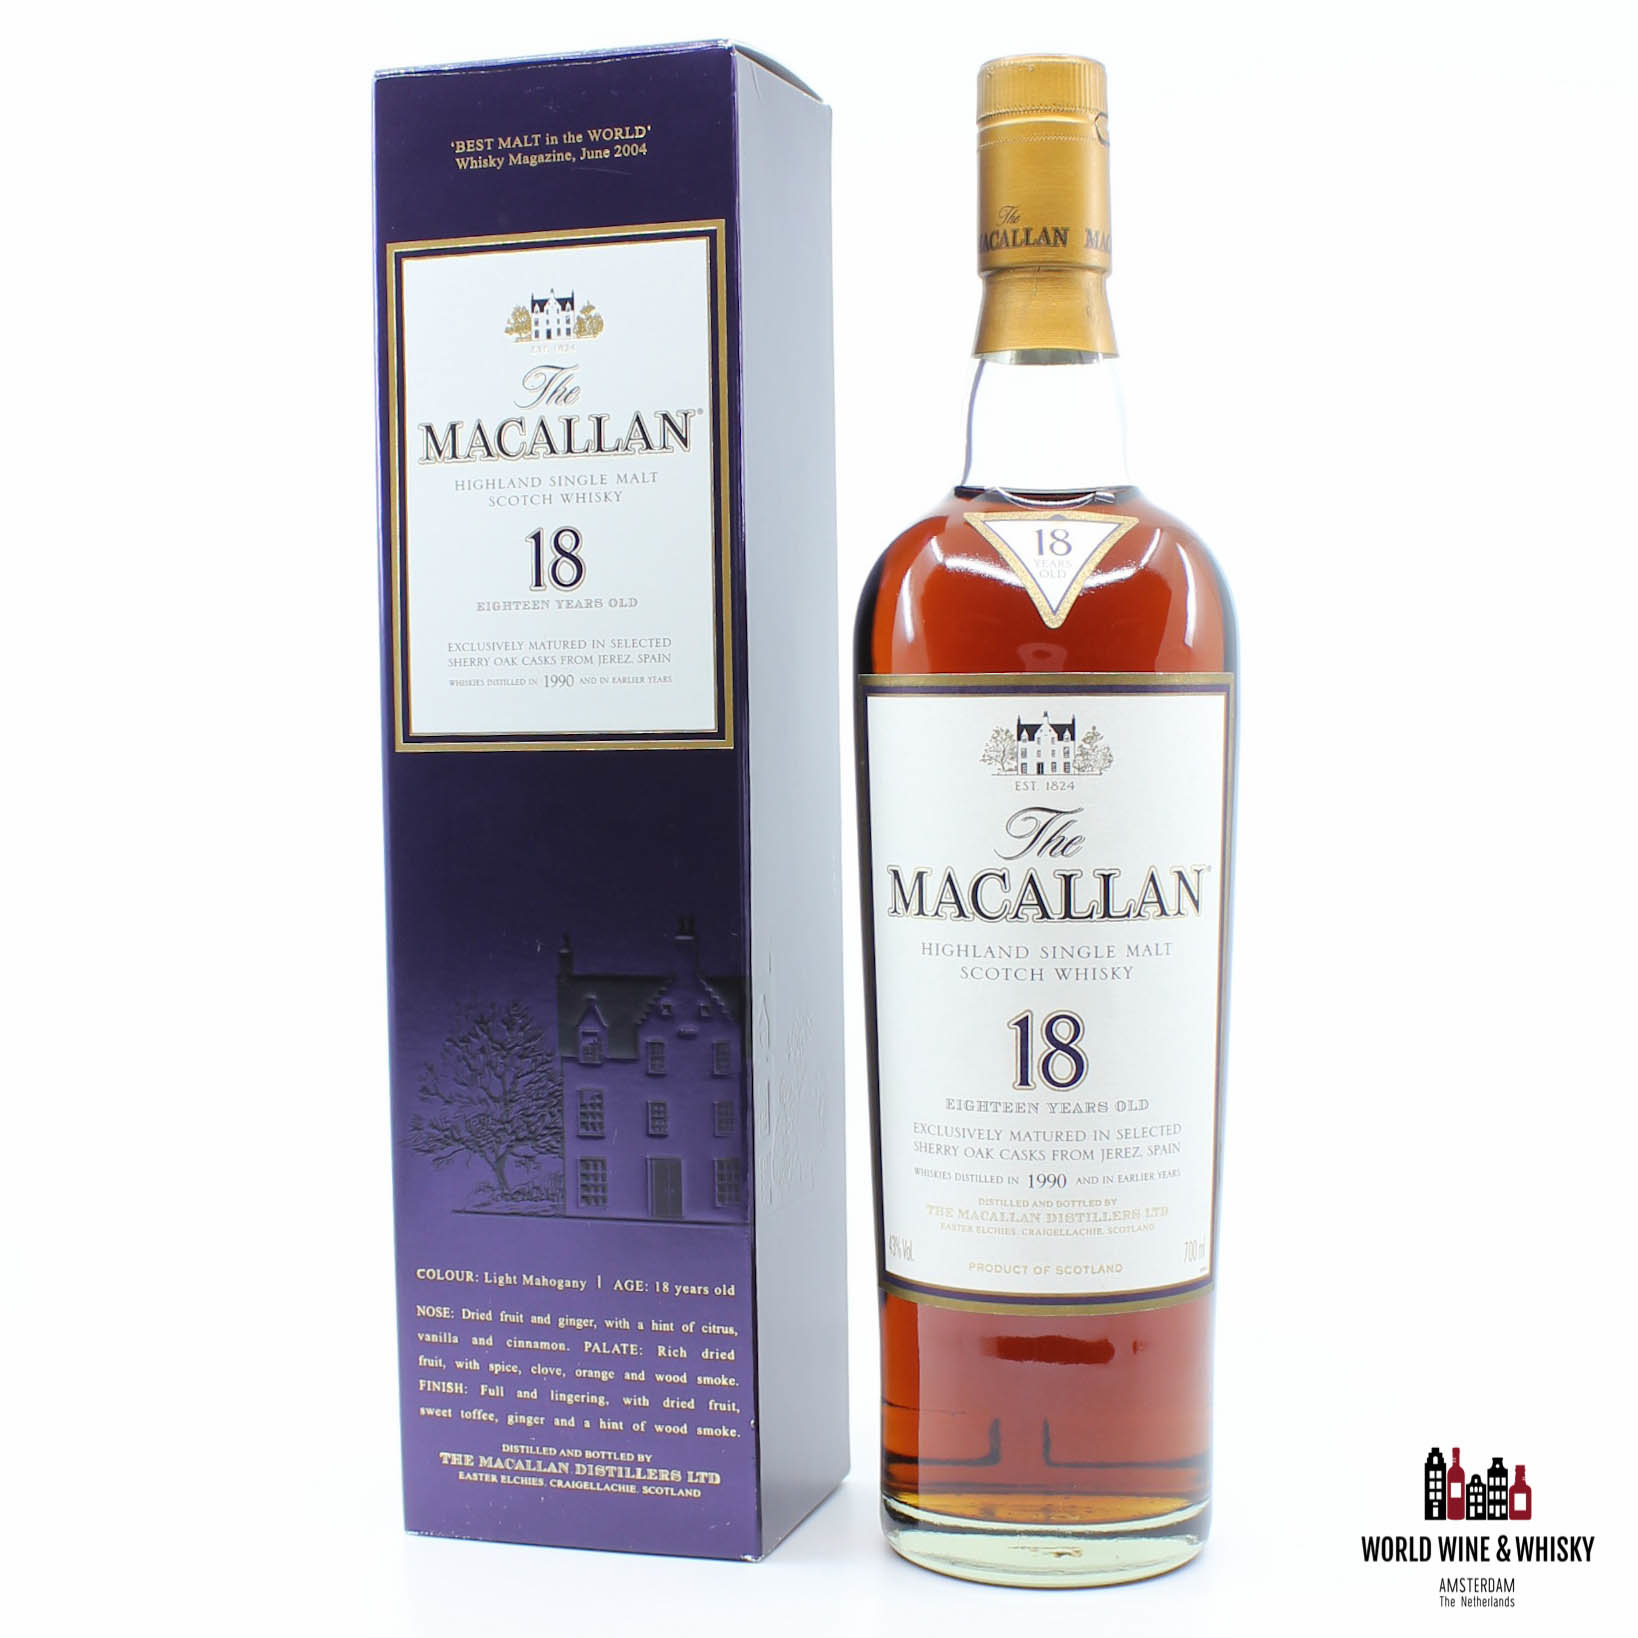 The Macallan 18 Years Old 1990 2008 Sherry Oak 43%.